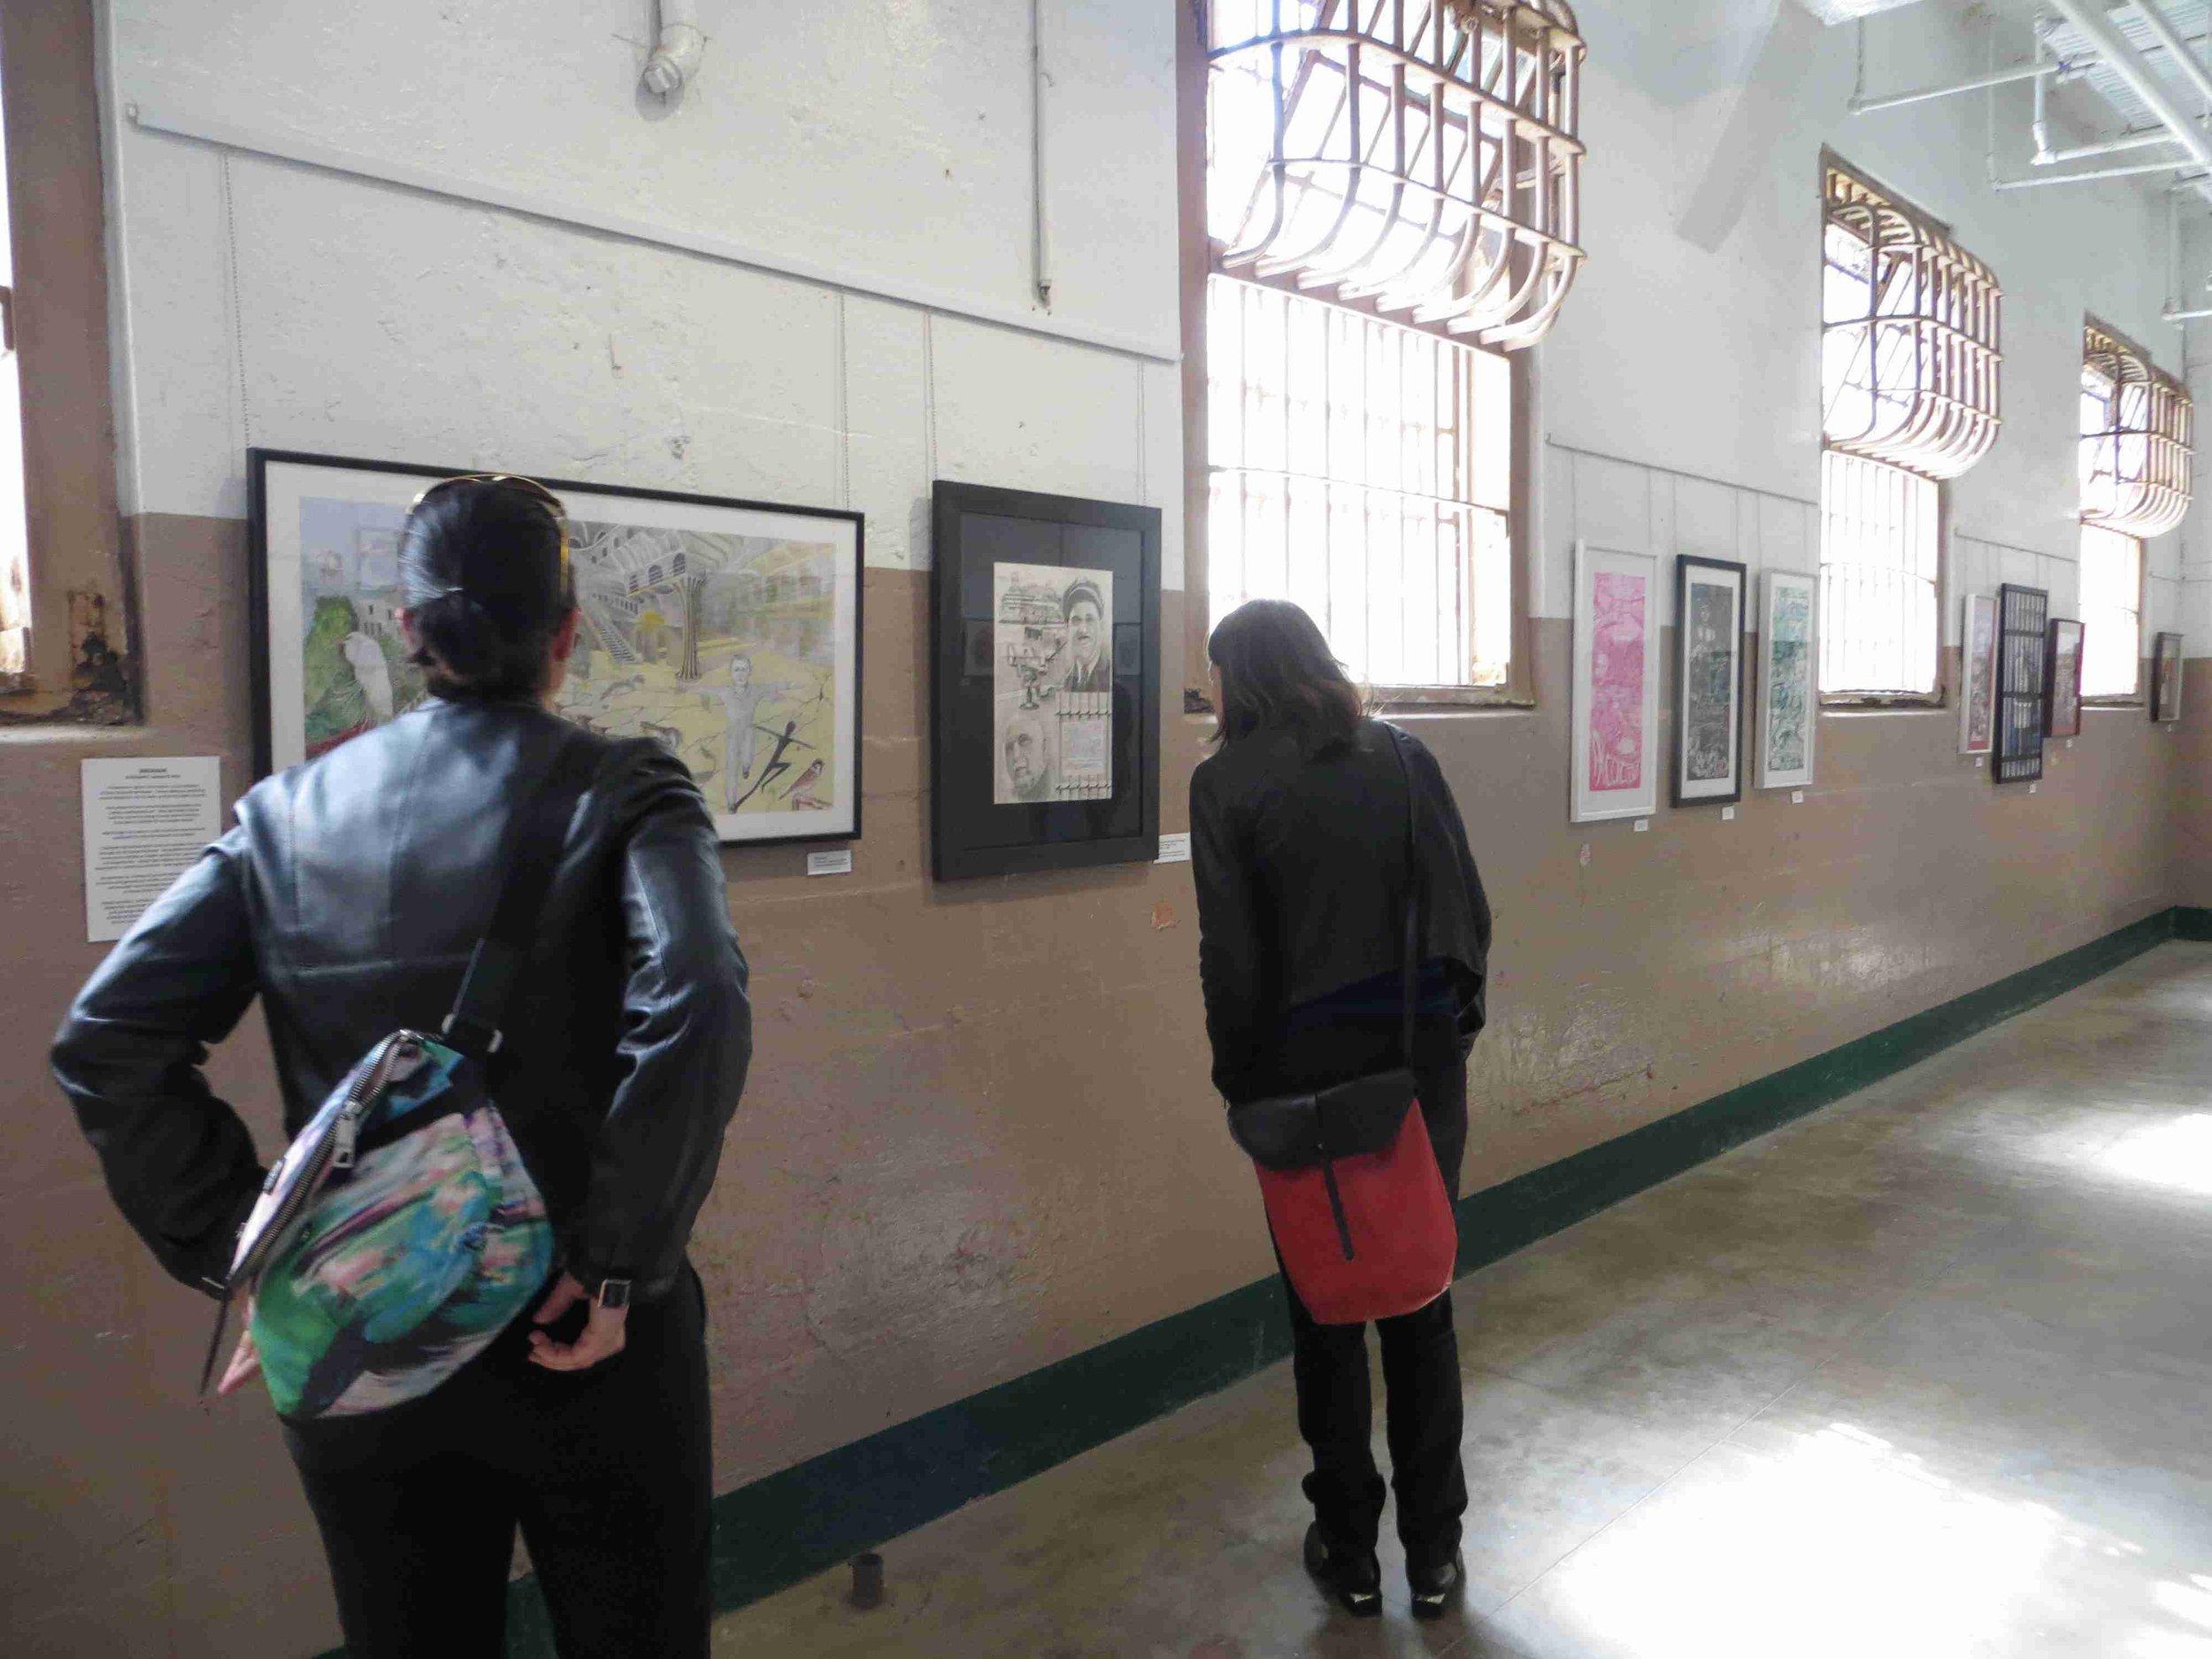 Lollypop Sundat at Alcatraz Band Practice Room-Int'l visitors held captive by art at Alcatraz (2).jpg